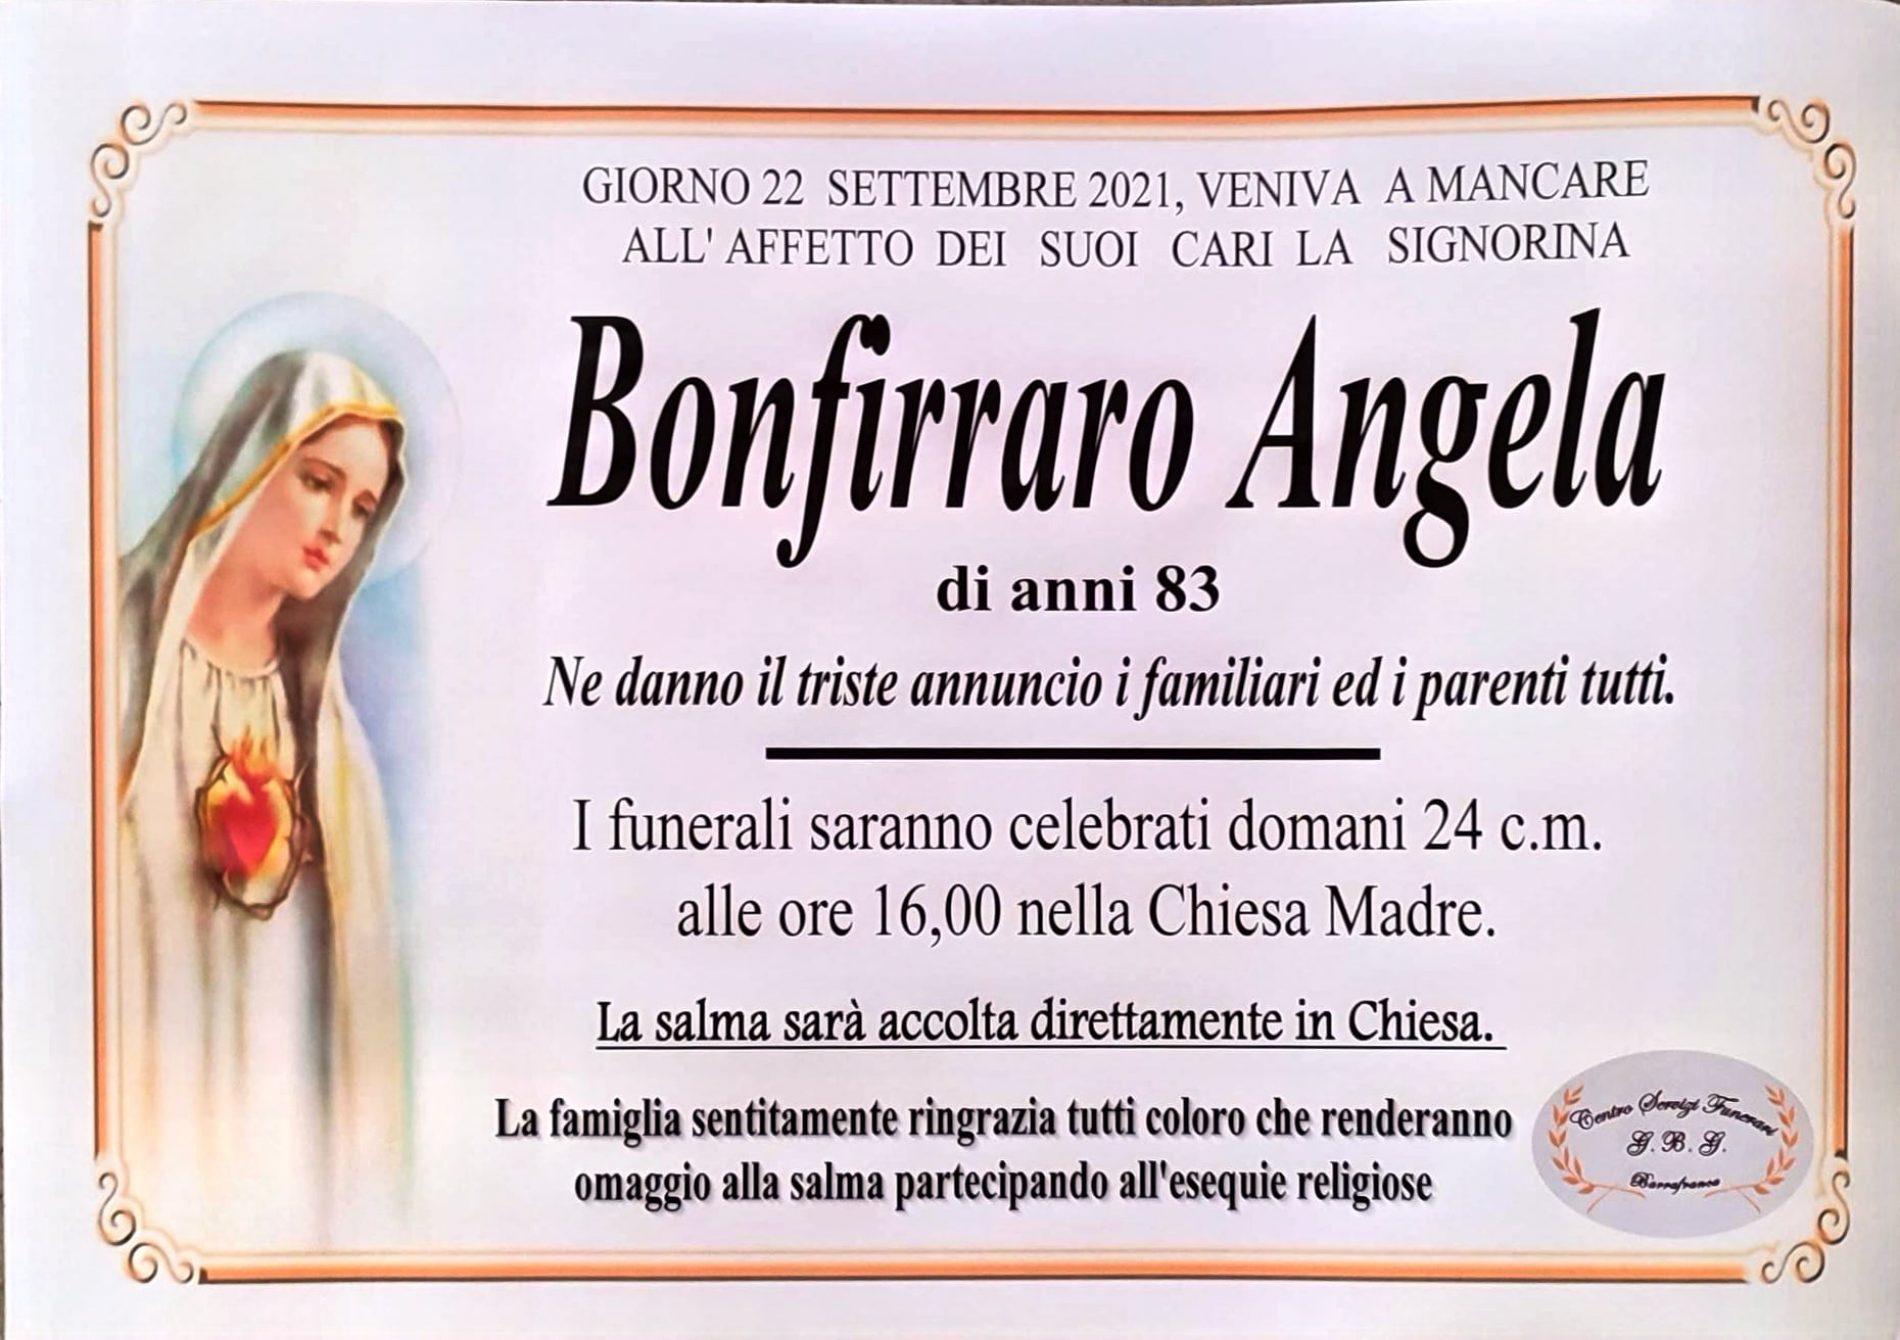 Annuncio servizi funerari agenzia G.B.G. sig.ra Bonfirraro Angela di anni 83